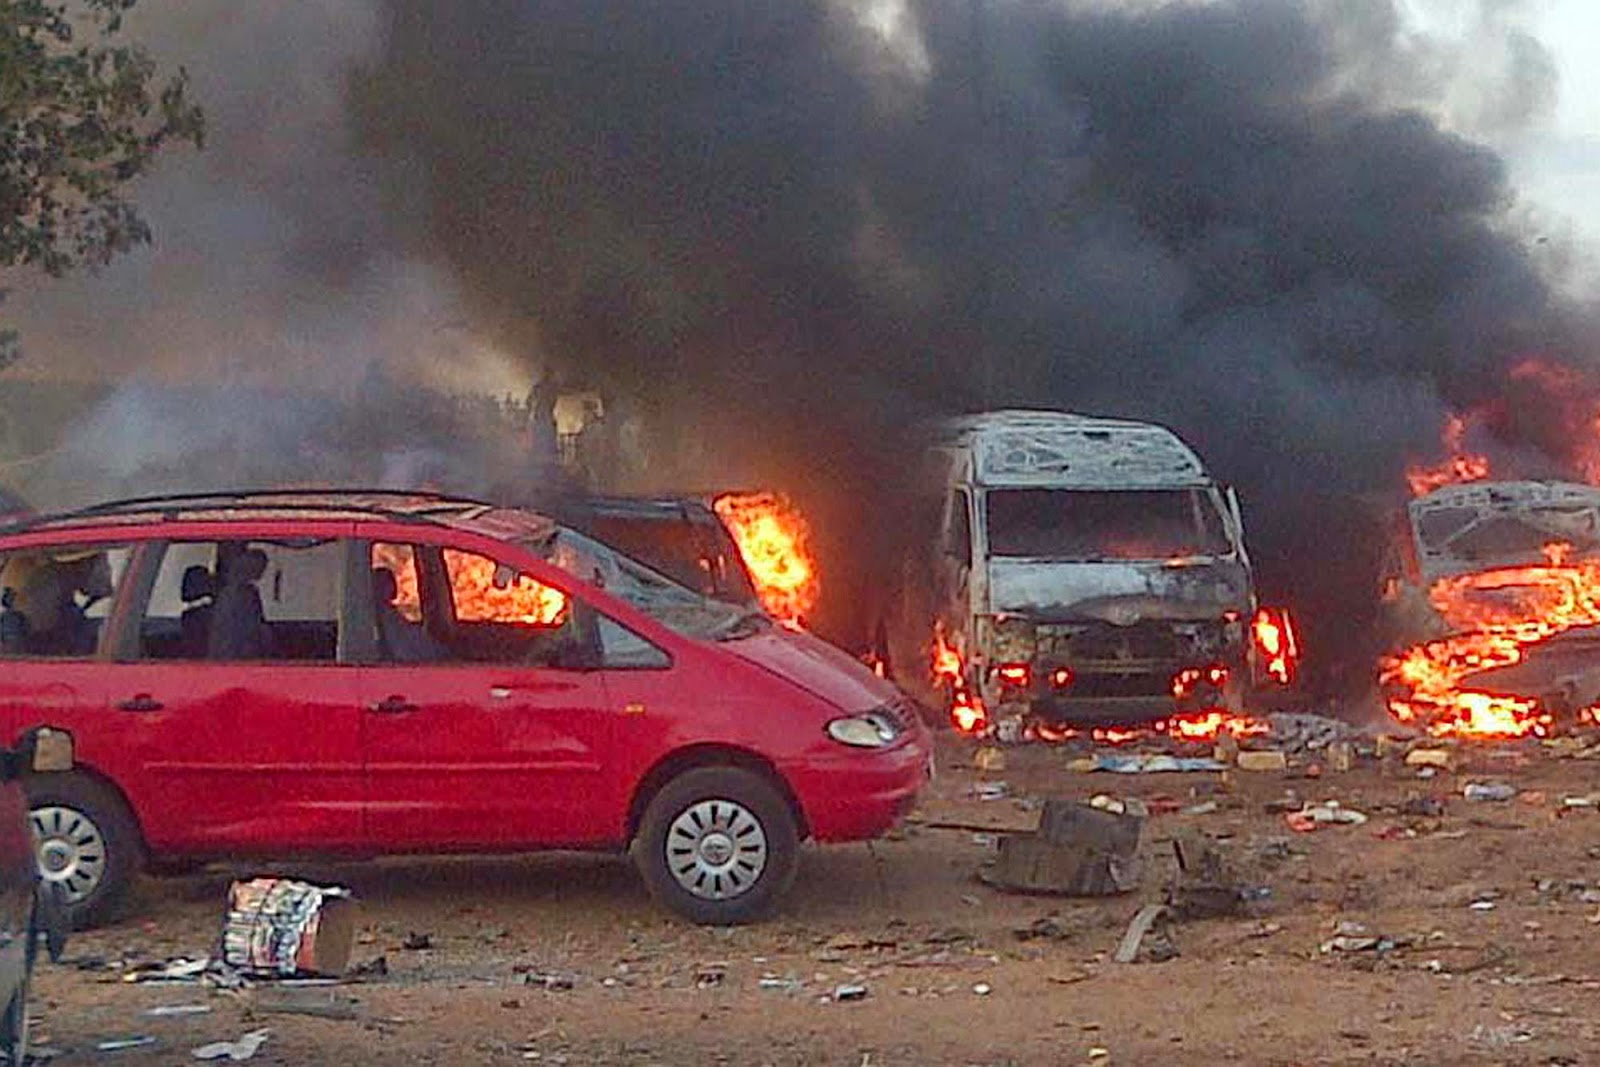 abuja park sucide bomber escaped